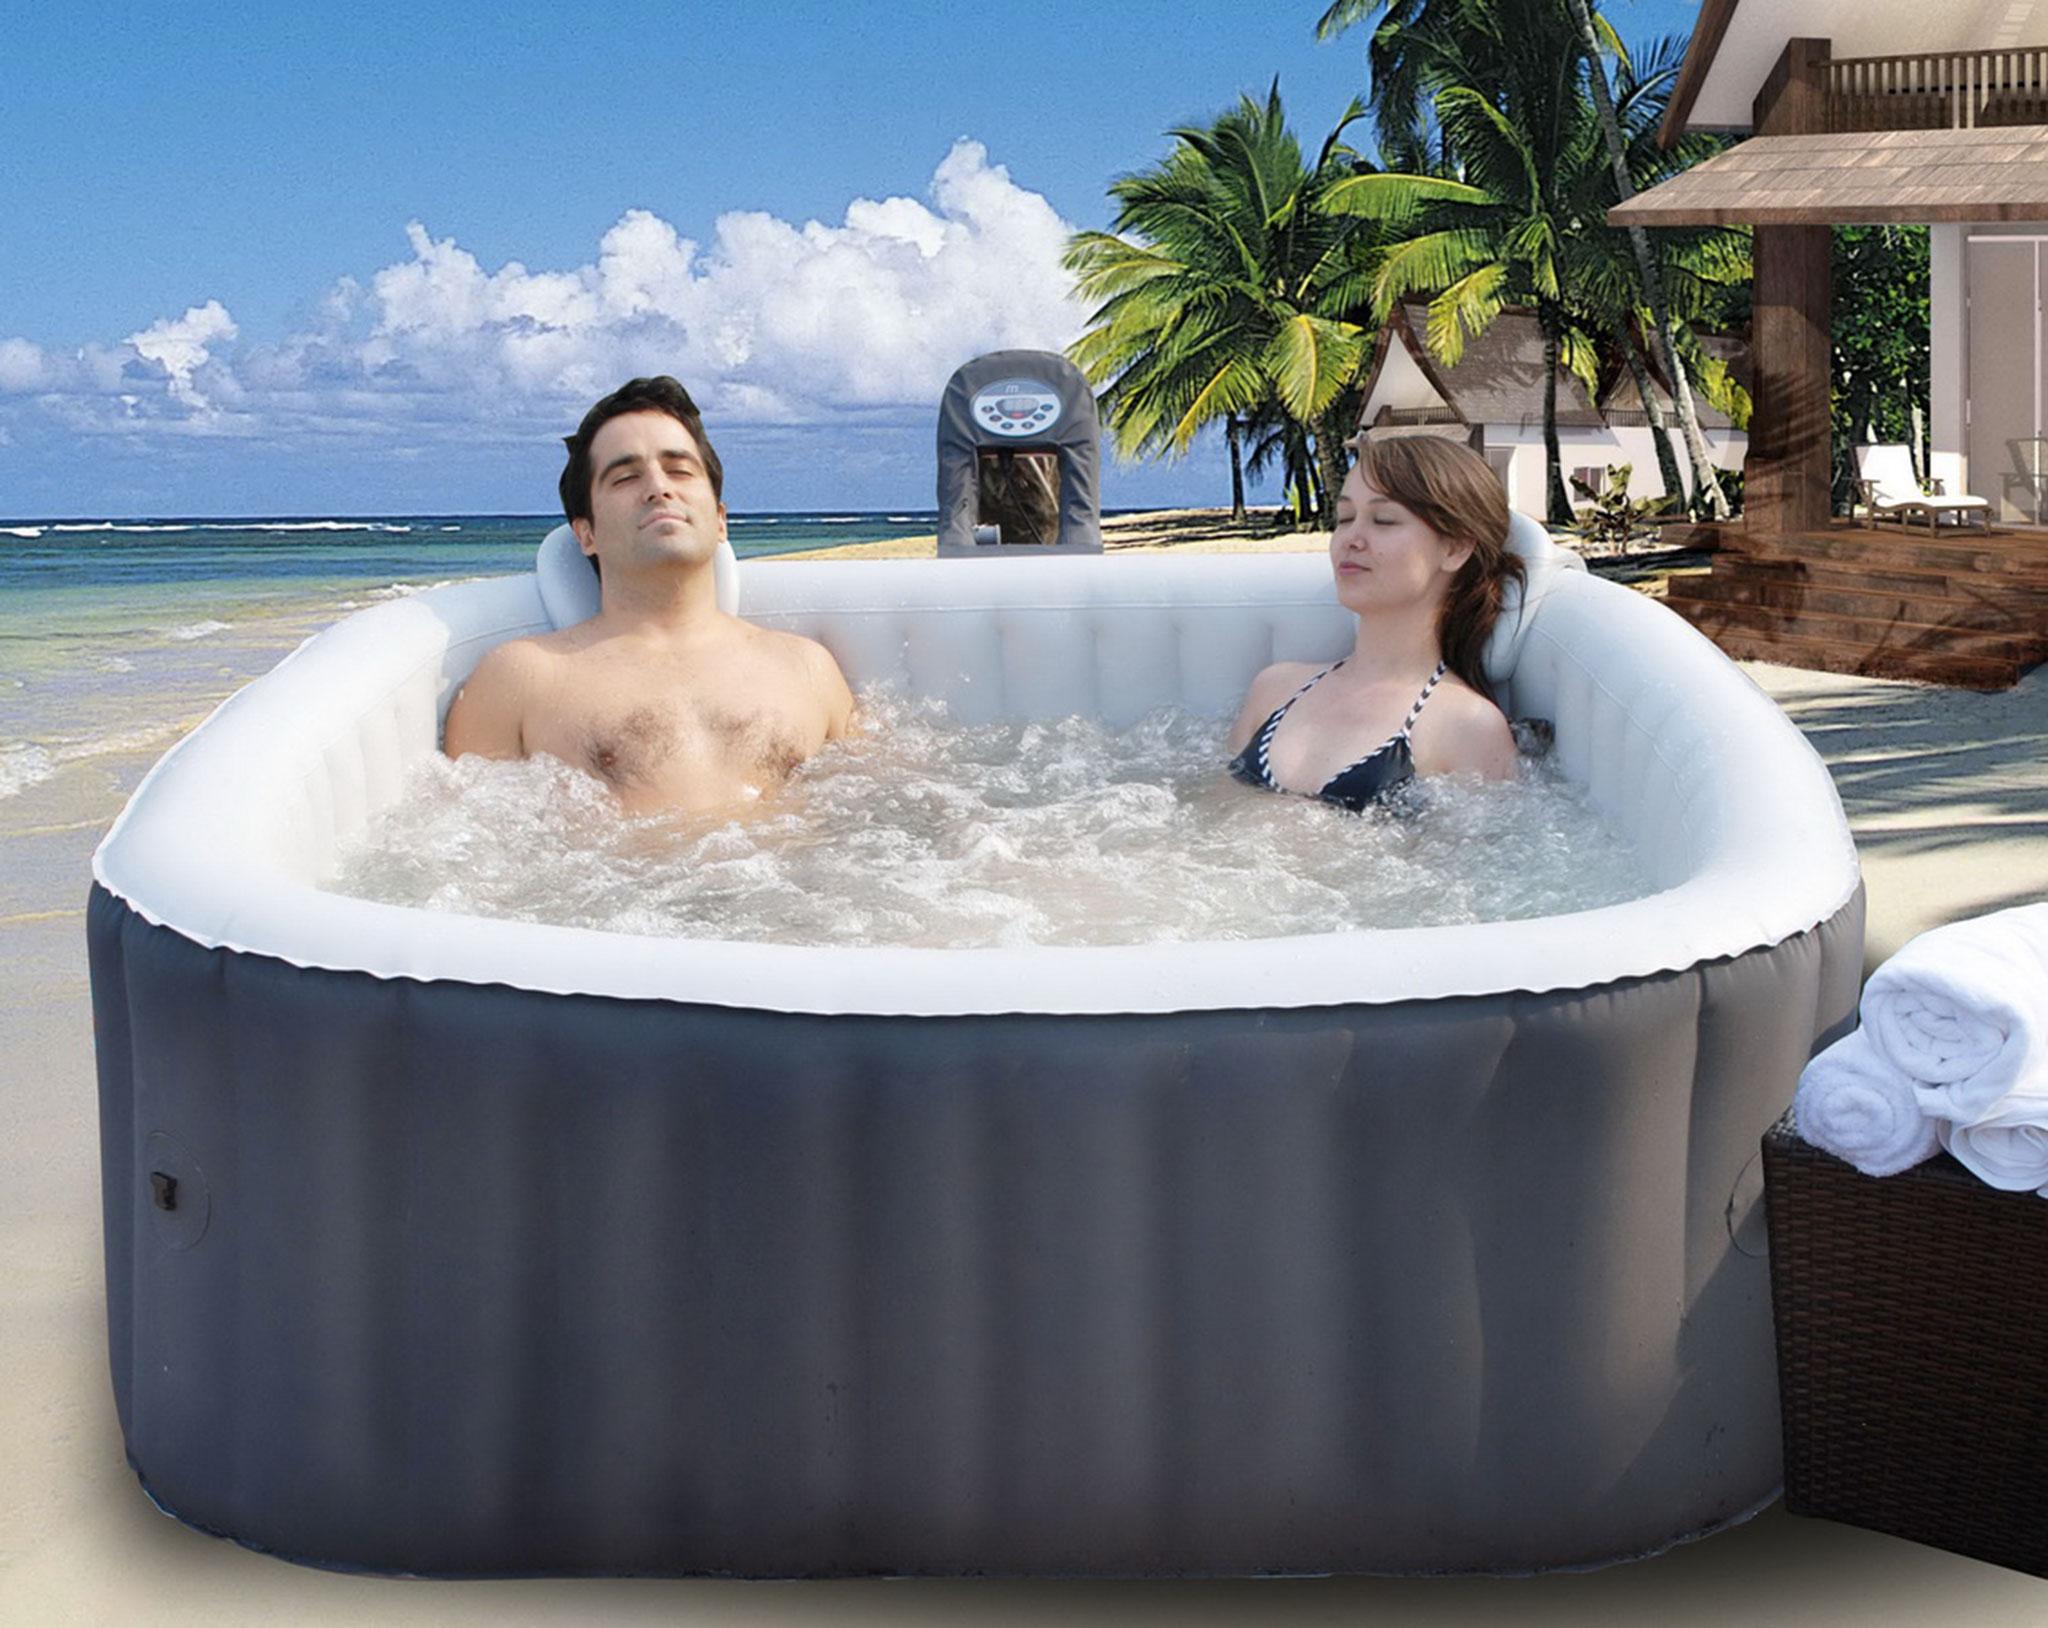 comment choisir son spa gonflable great comment choisir un spa exterieur spa de nage comment. Black Bedroom Furniture Sets. Home Design Ideas